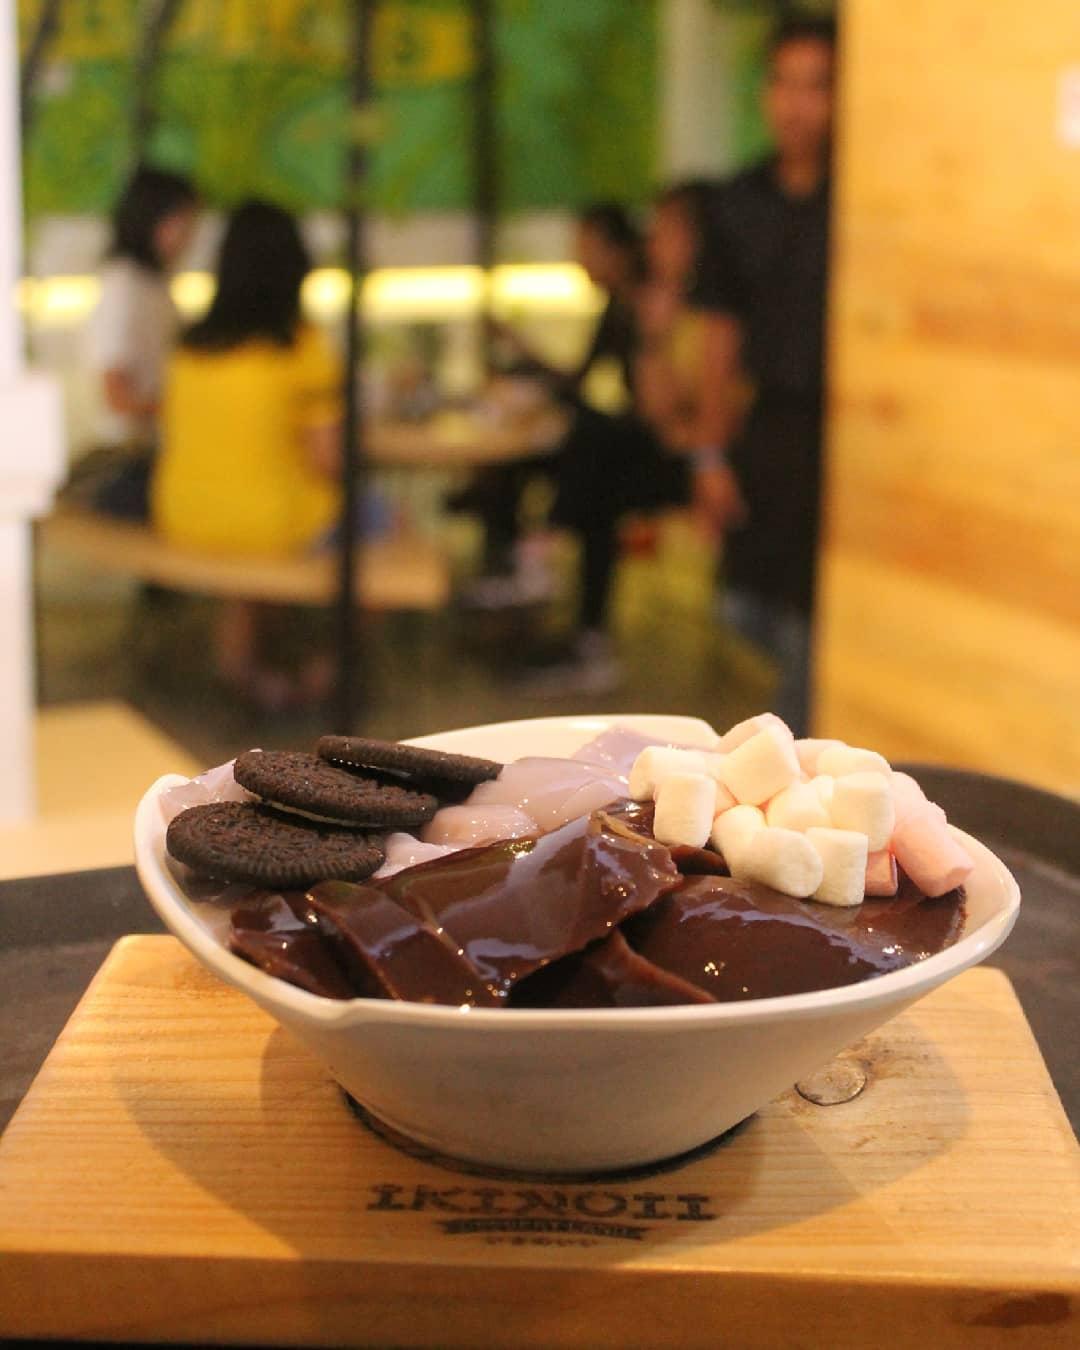 Dessert Manis, Dessert Manis Malang, Malang, Dolan Dolen, Dolaners Dessert Manis via ikinoiidessertland - Dolan Dolen